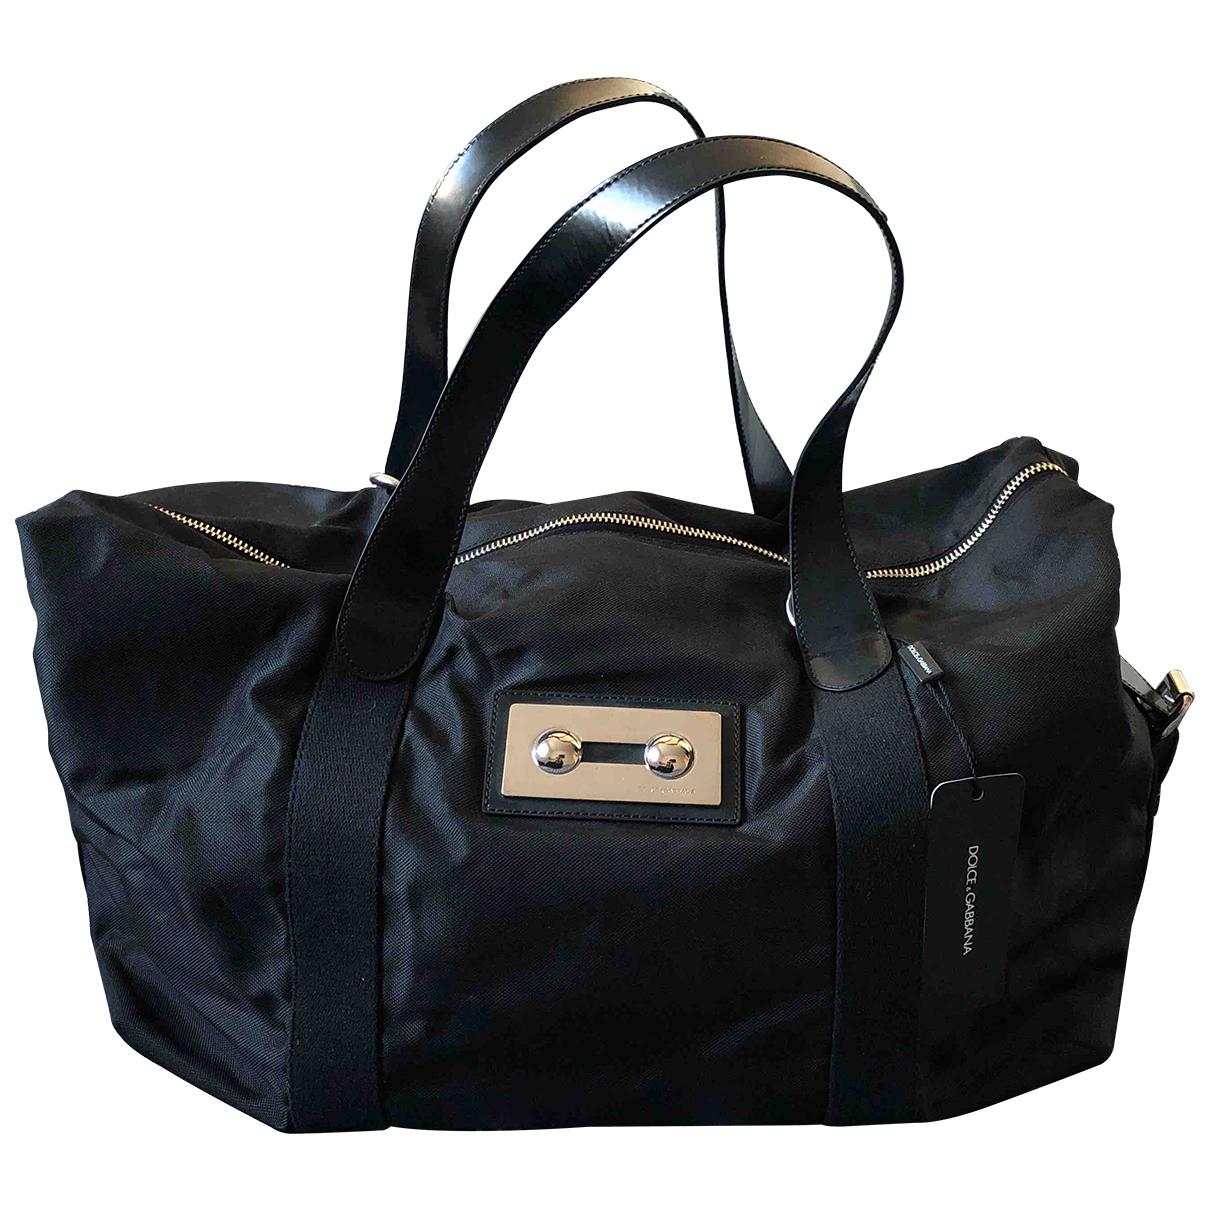 Dolce & Gabbana N Black Travel bag for Women N